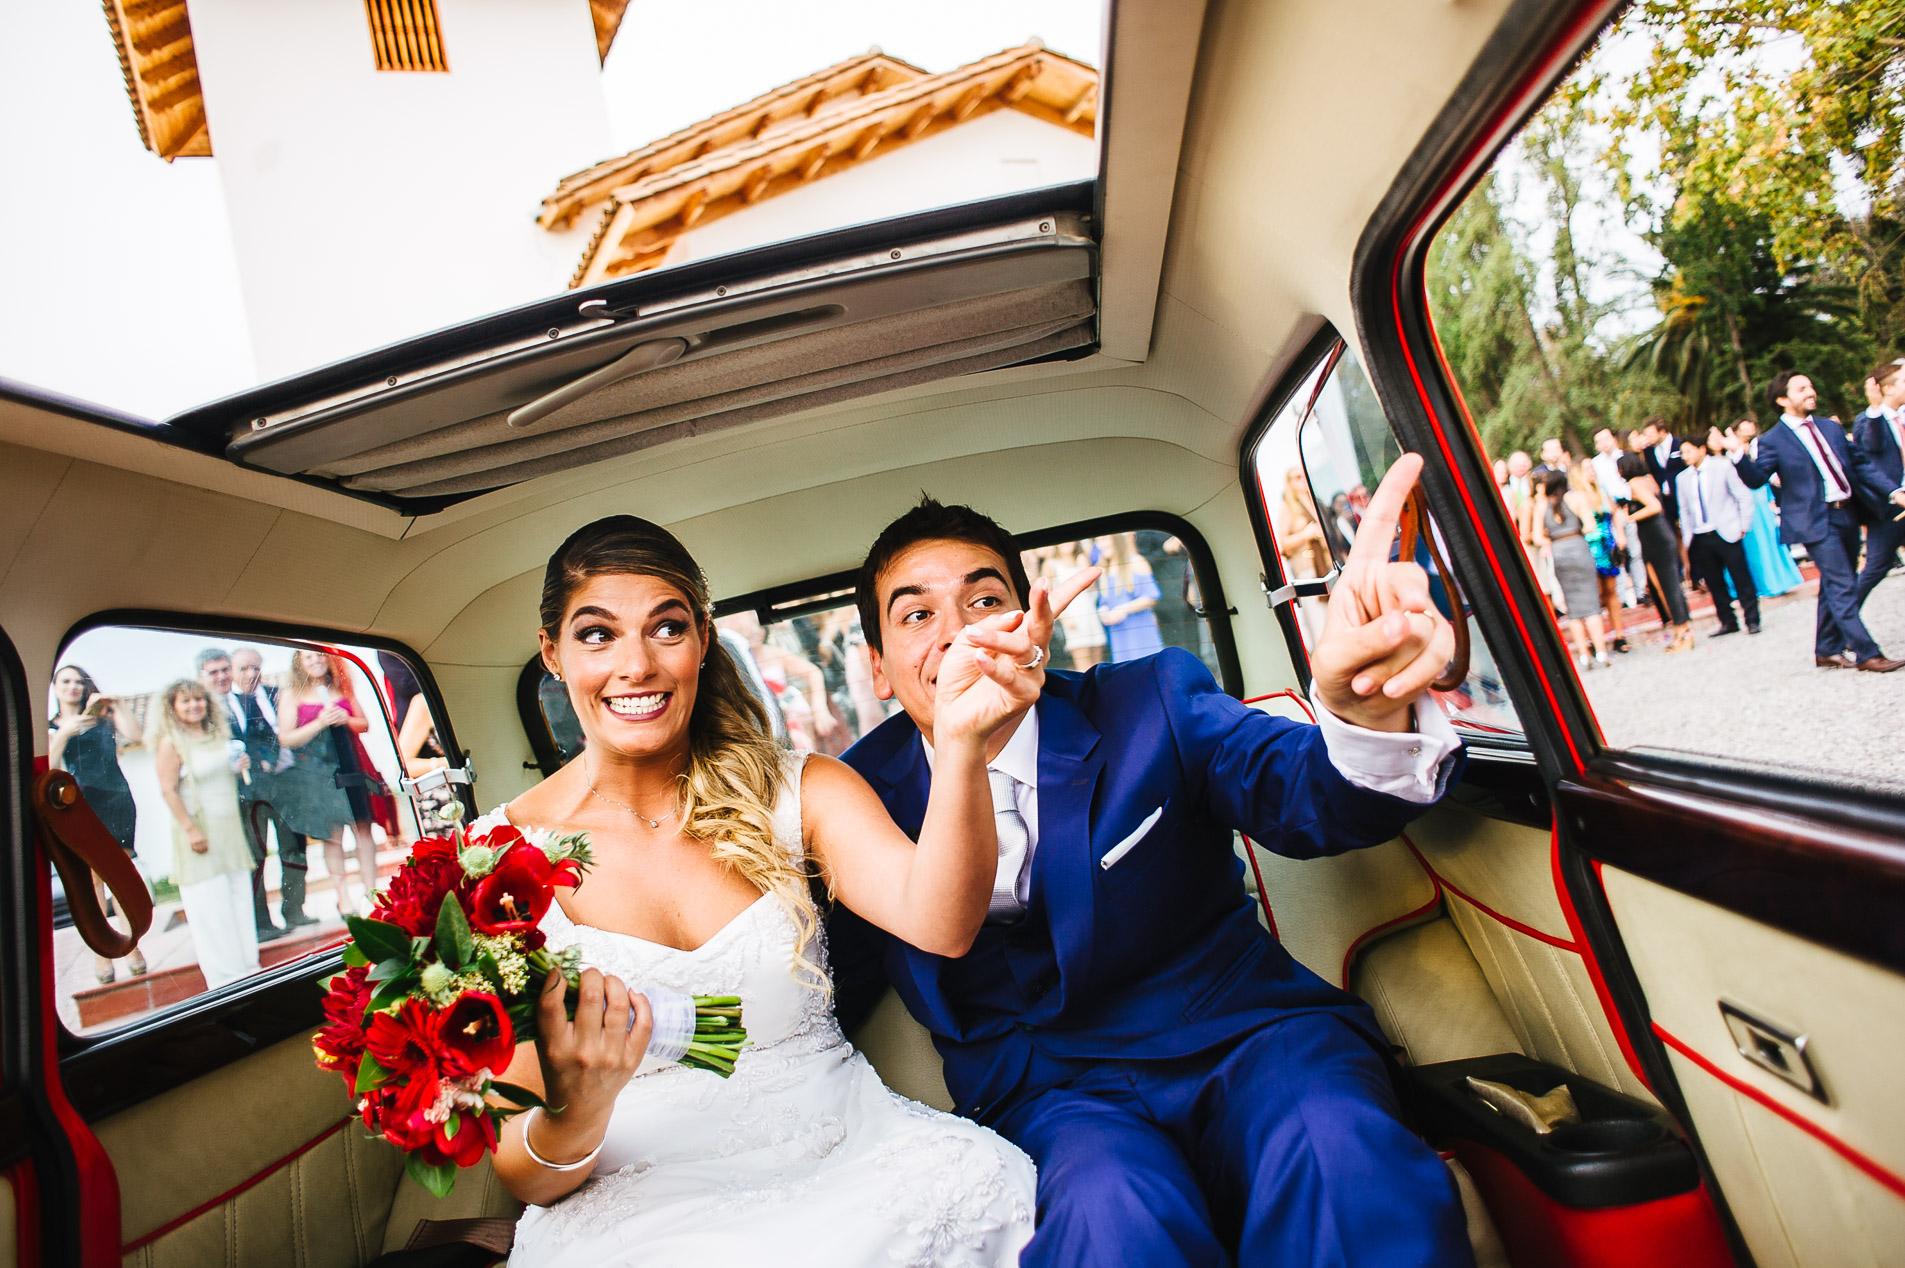 Mariana-Cristian-Fotos-Matrimonio-22